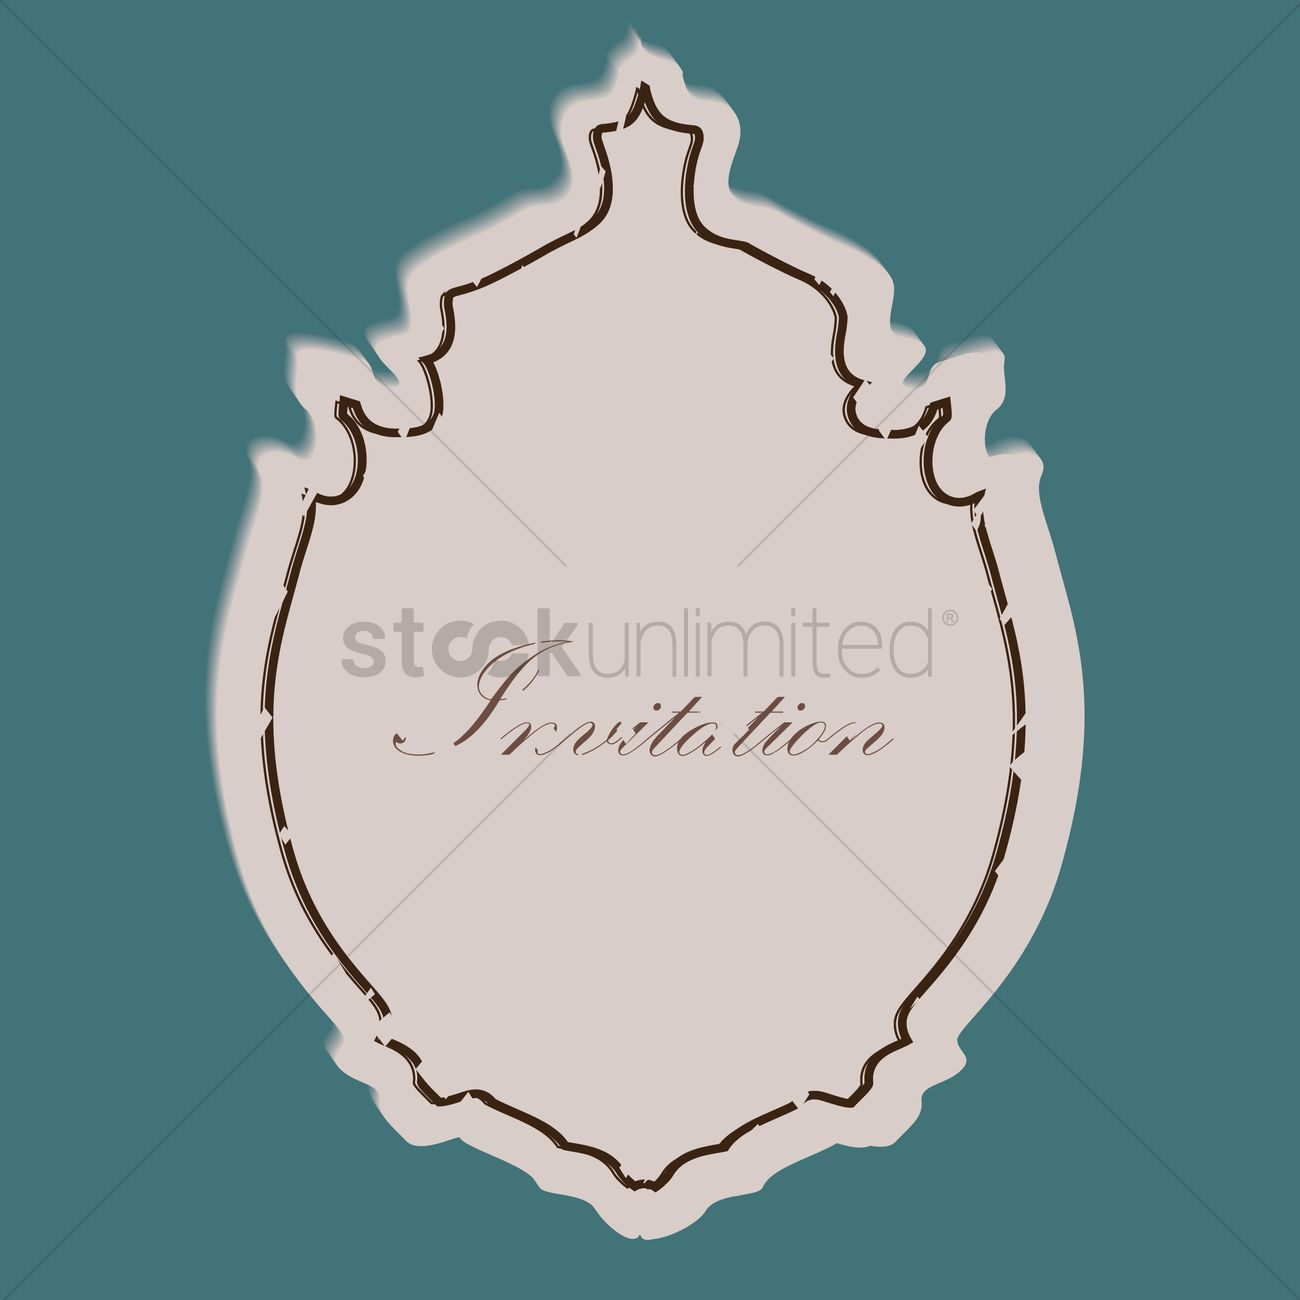 Invitation label vector image 1443075 stockunlimited invitation label vector graphic stopboris Images